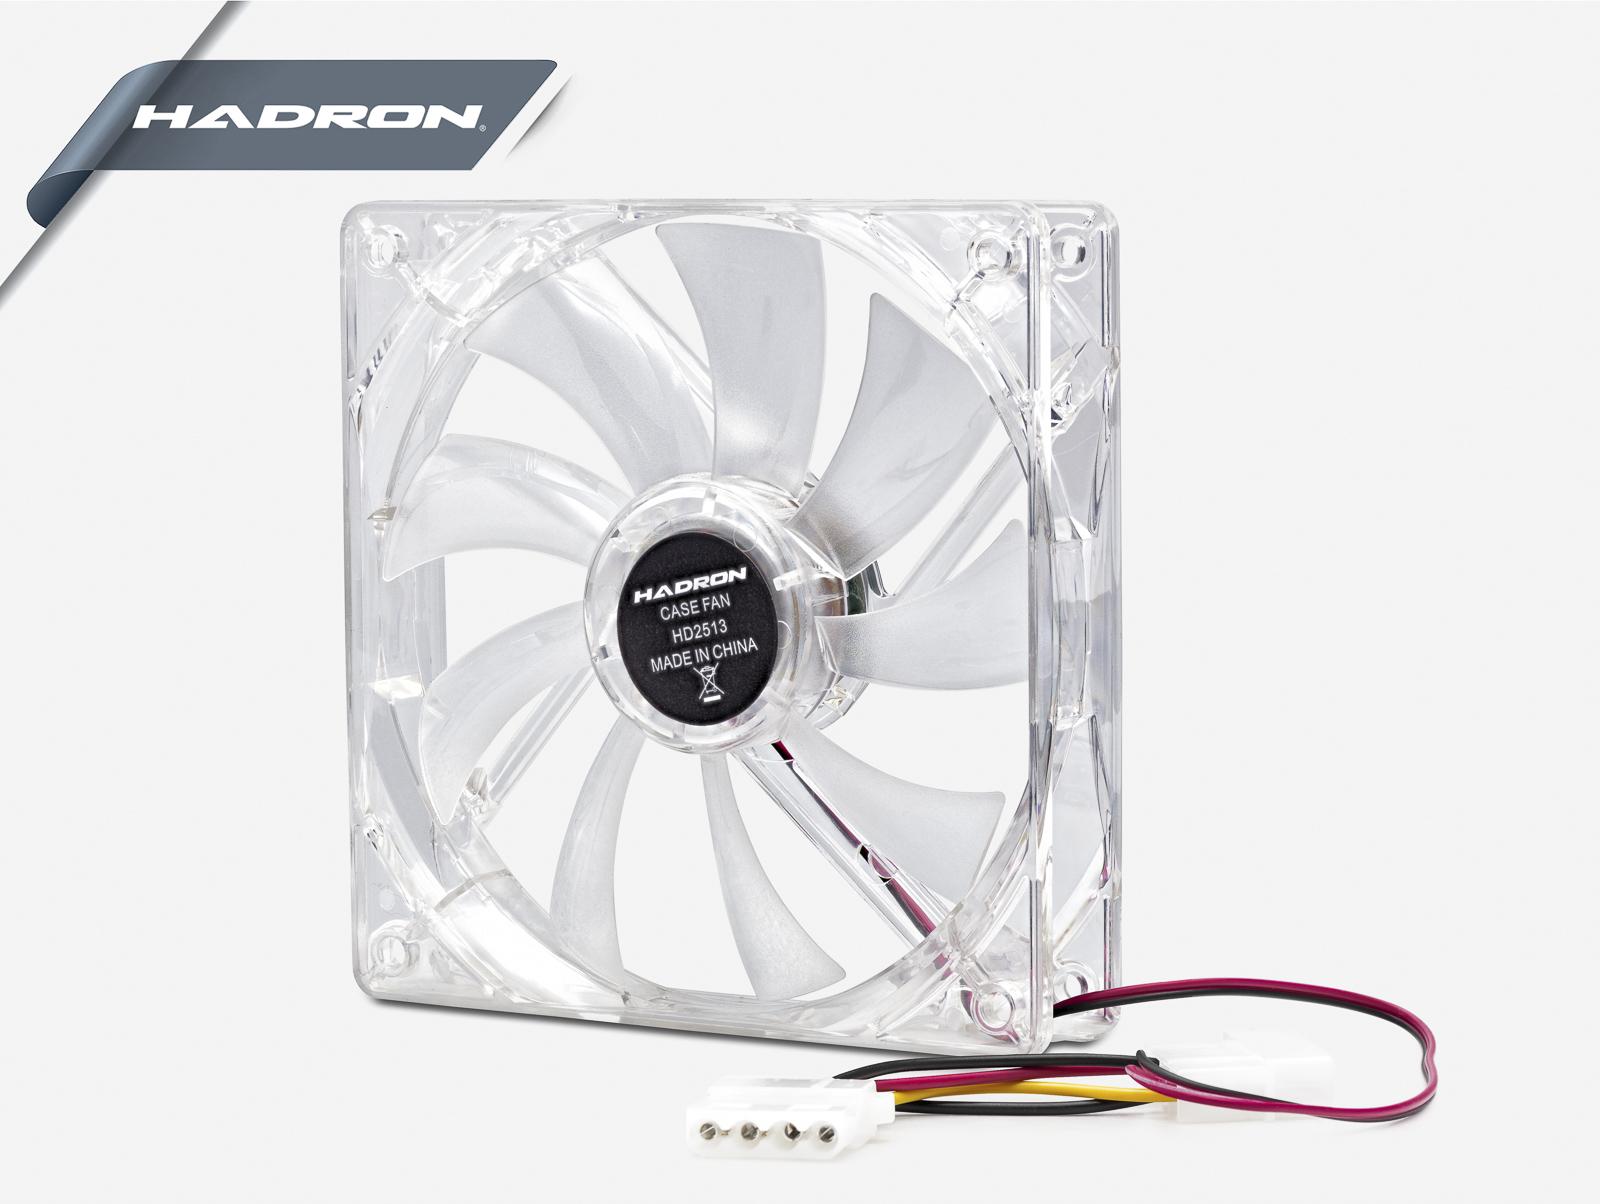 Hadron Hd2513 Kasa Fanı 12Cm Işıklı Lux Tasarım